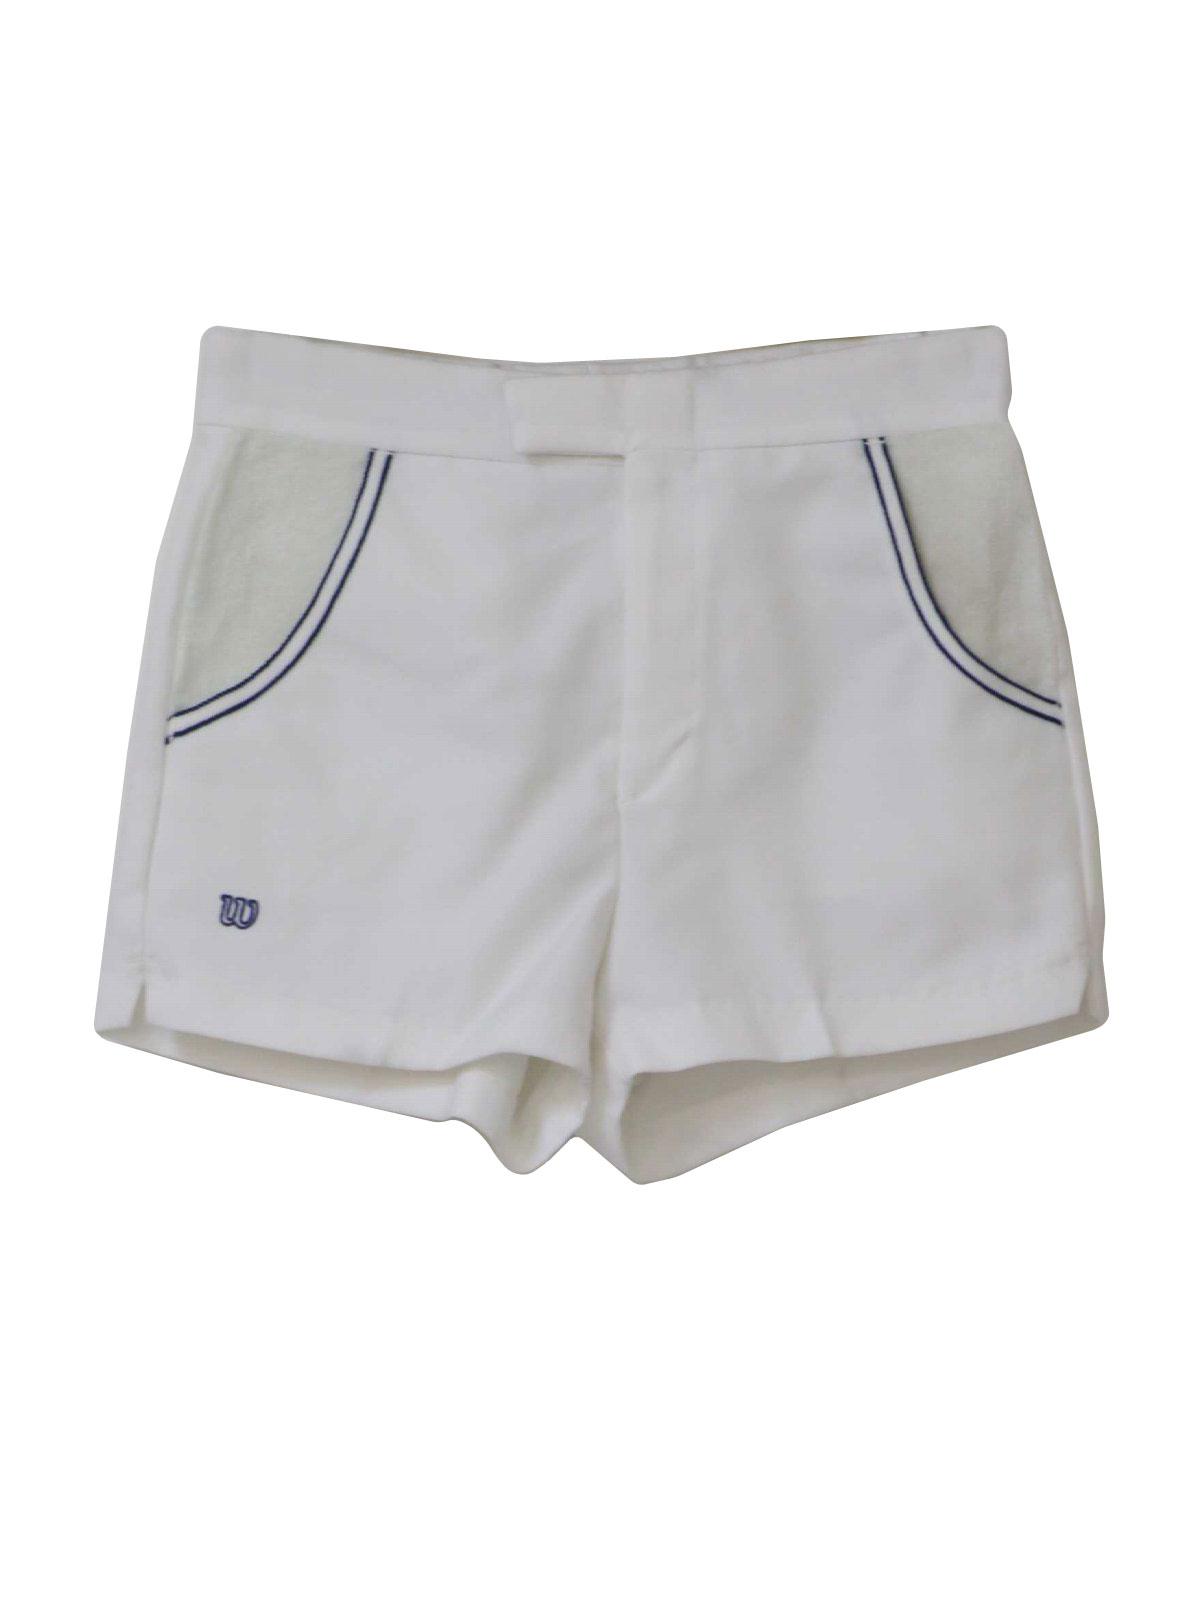 80s Vintage Wilson Tennis Apparel Shorts: 80s -Wilson